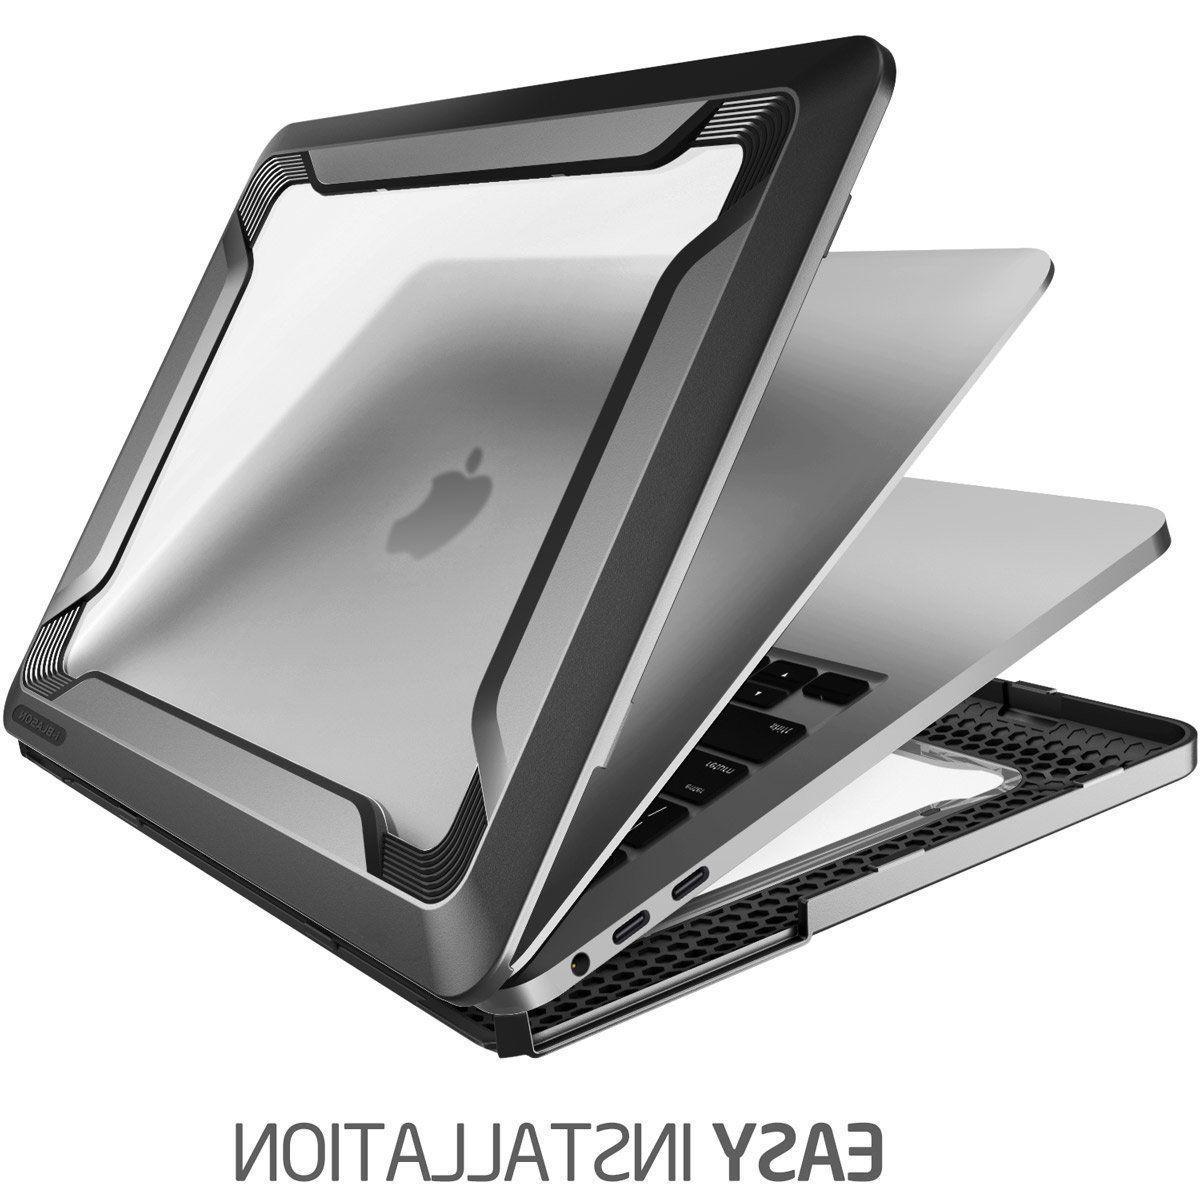 "For Apple MacBook Pro 15"", i-Blason Hard Laptop Case 360° F"